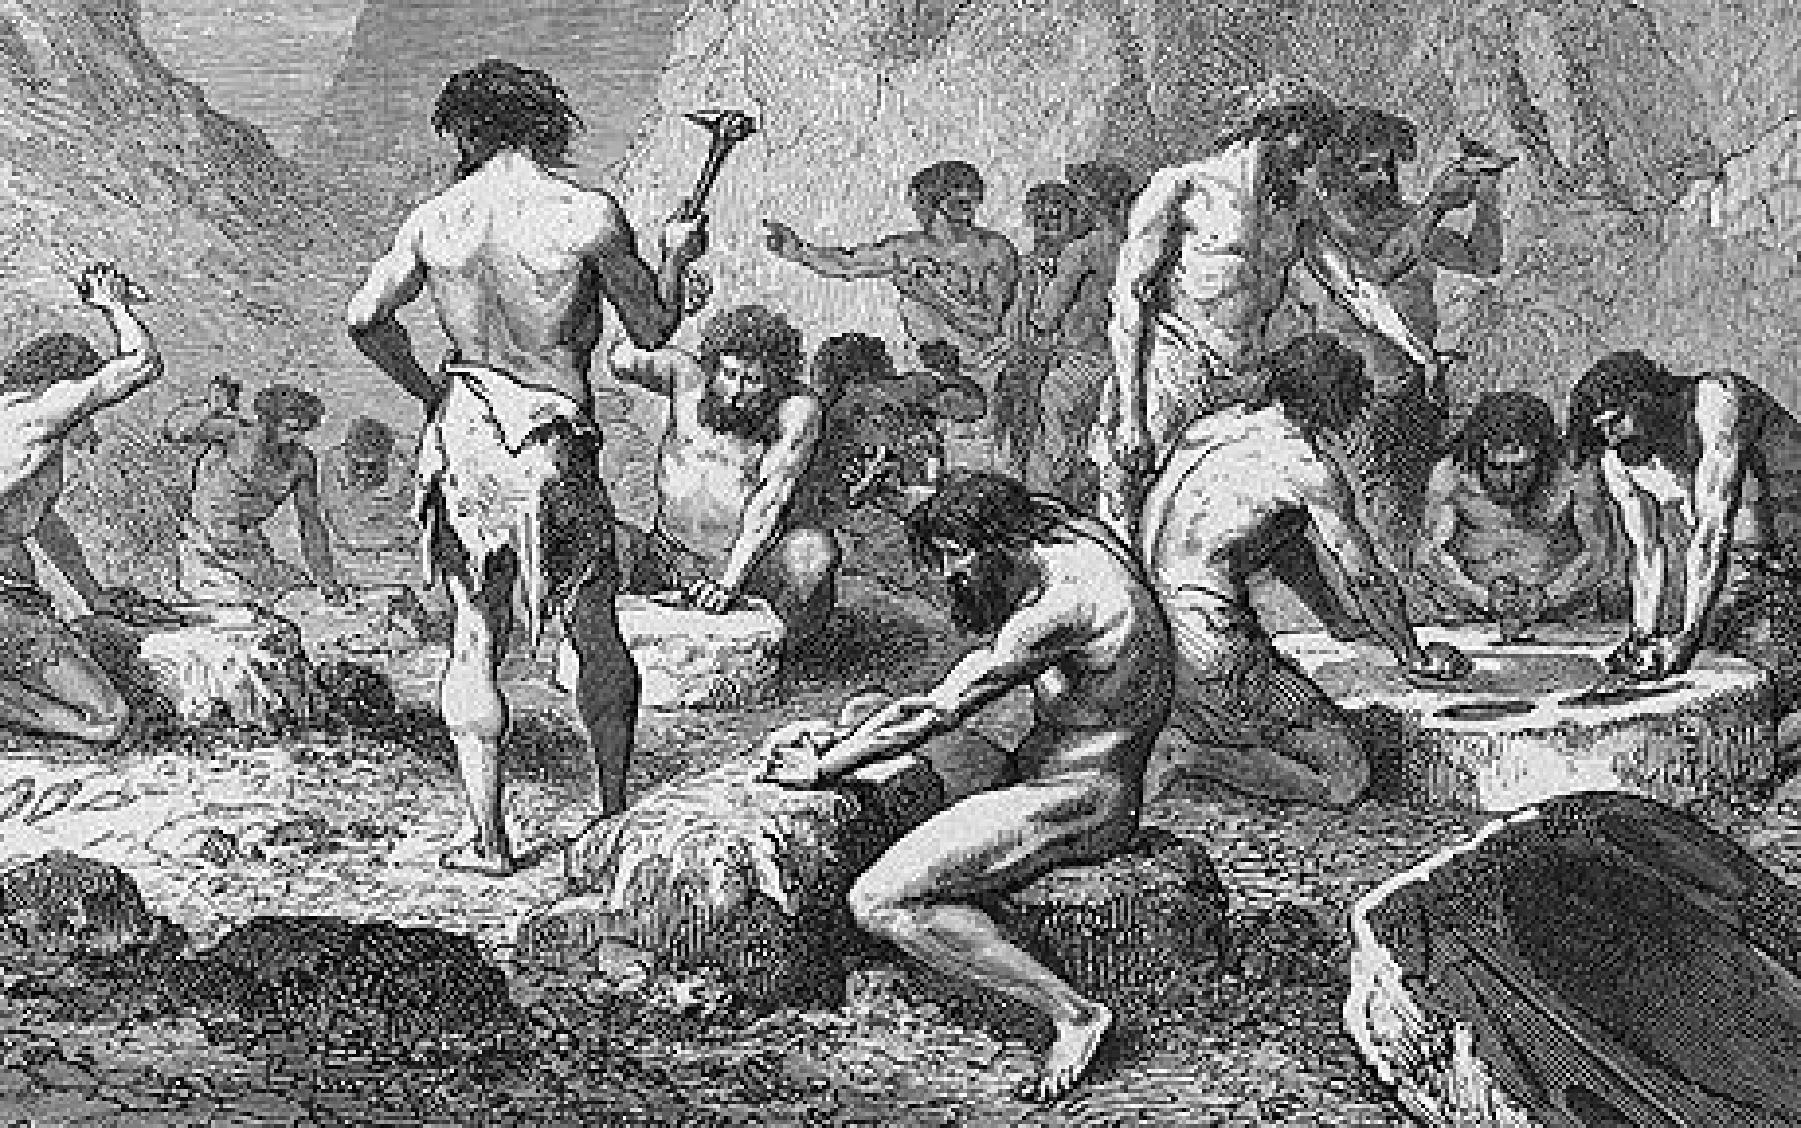 art history essay on bronze age